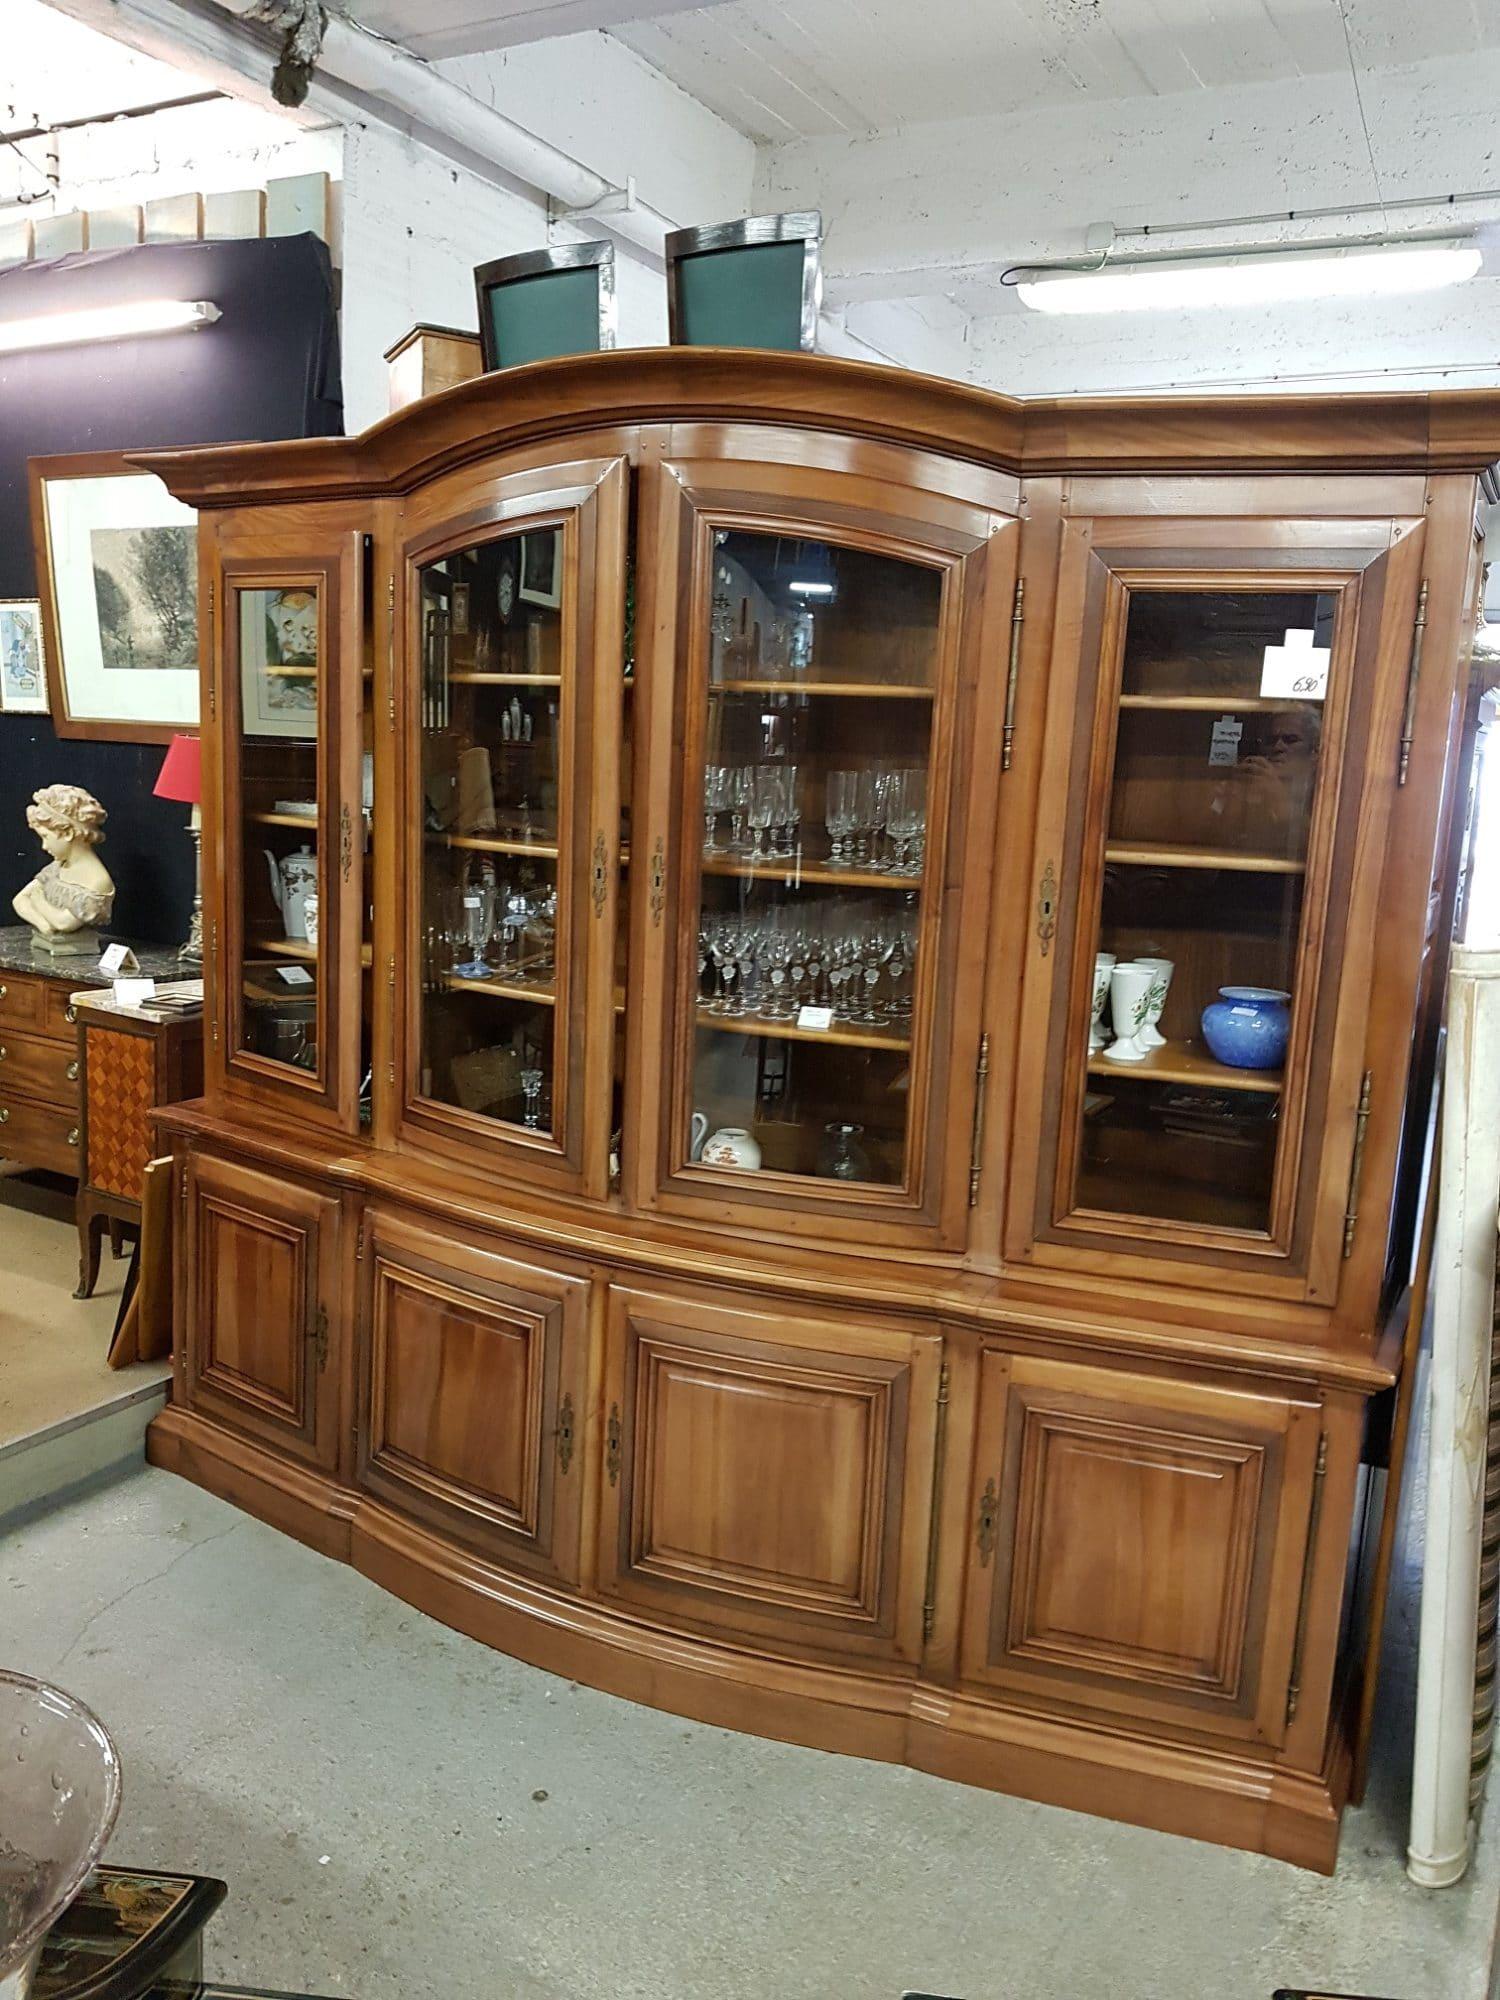 biblioth ques vitrines archives la cal che caennaise caen normandie la cal che caennaise. Black Bedroom Furniture Sets. Home Design Ideas